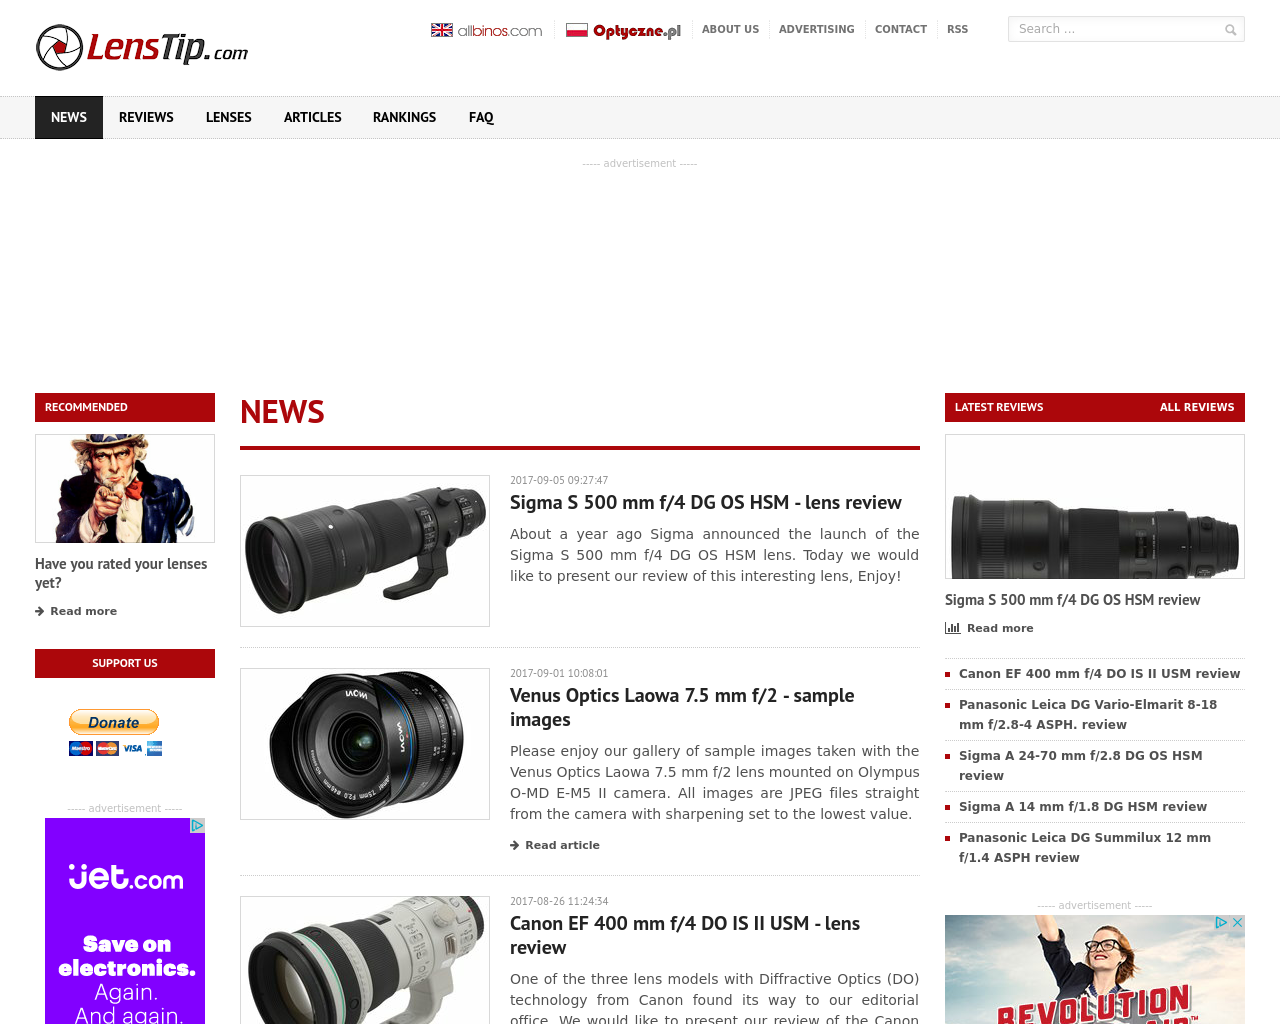 LensTip-Advertising-Reviews-Pricing